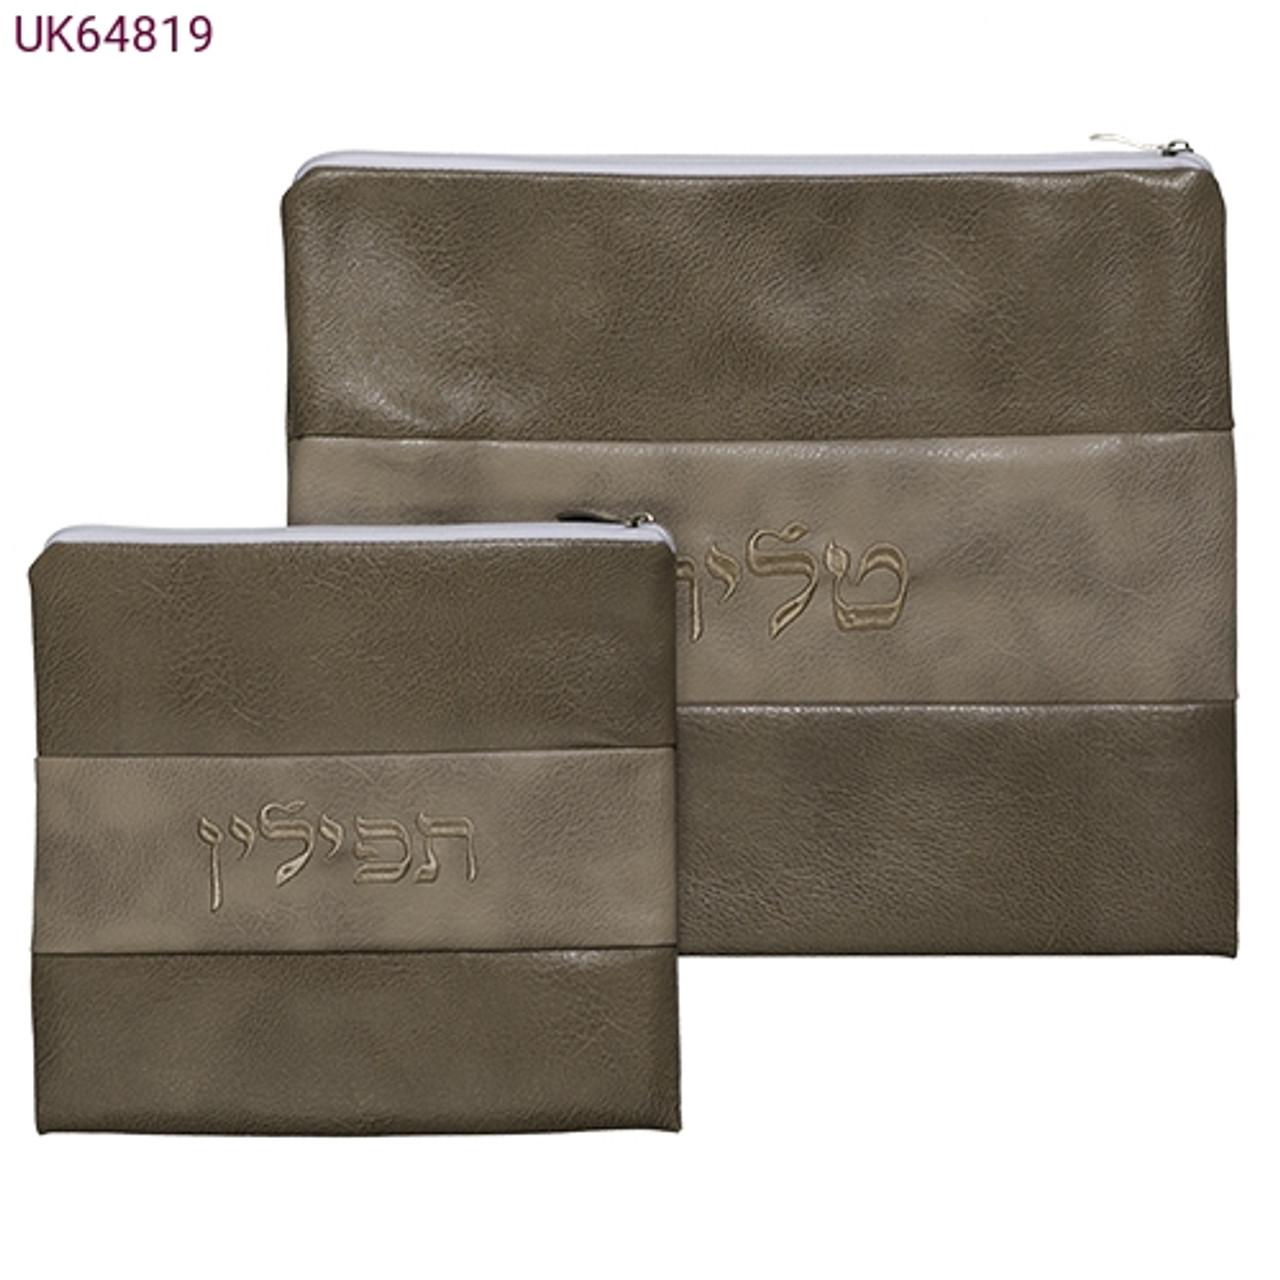 Faux Leather Brown & Tan Tallit Bag